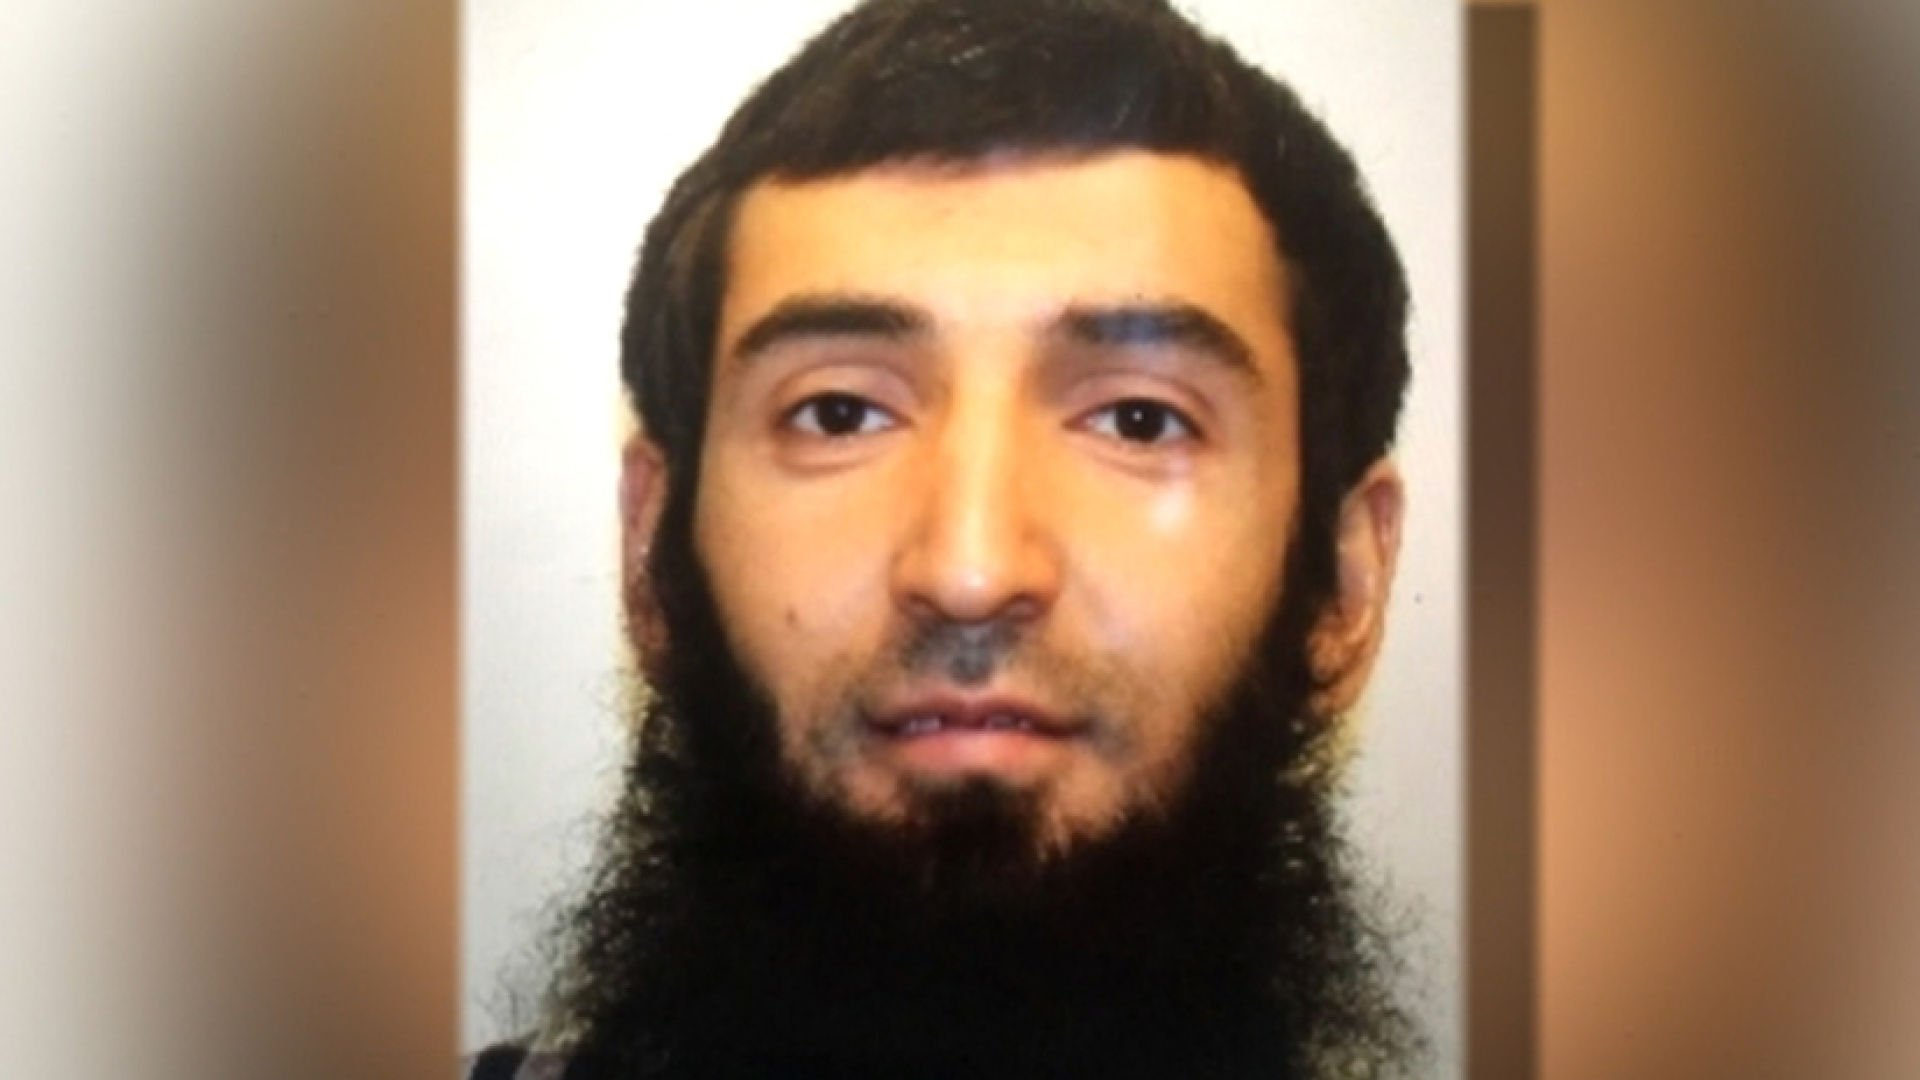 Sayfullo Habibullaevic Saipov, accused of killing 8 in New York City terror attack.